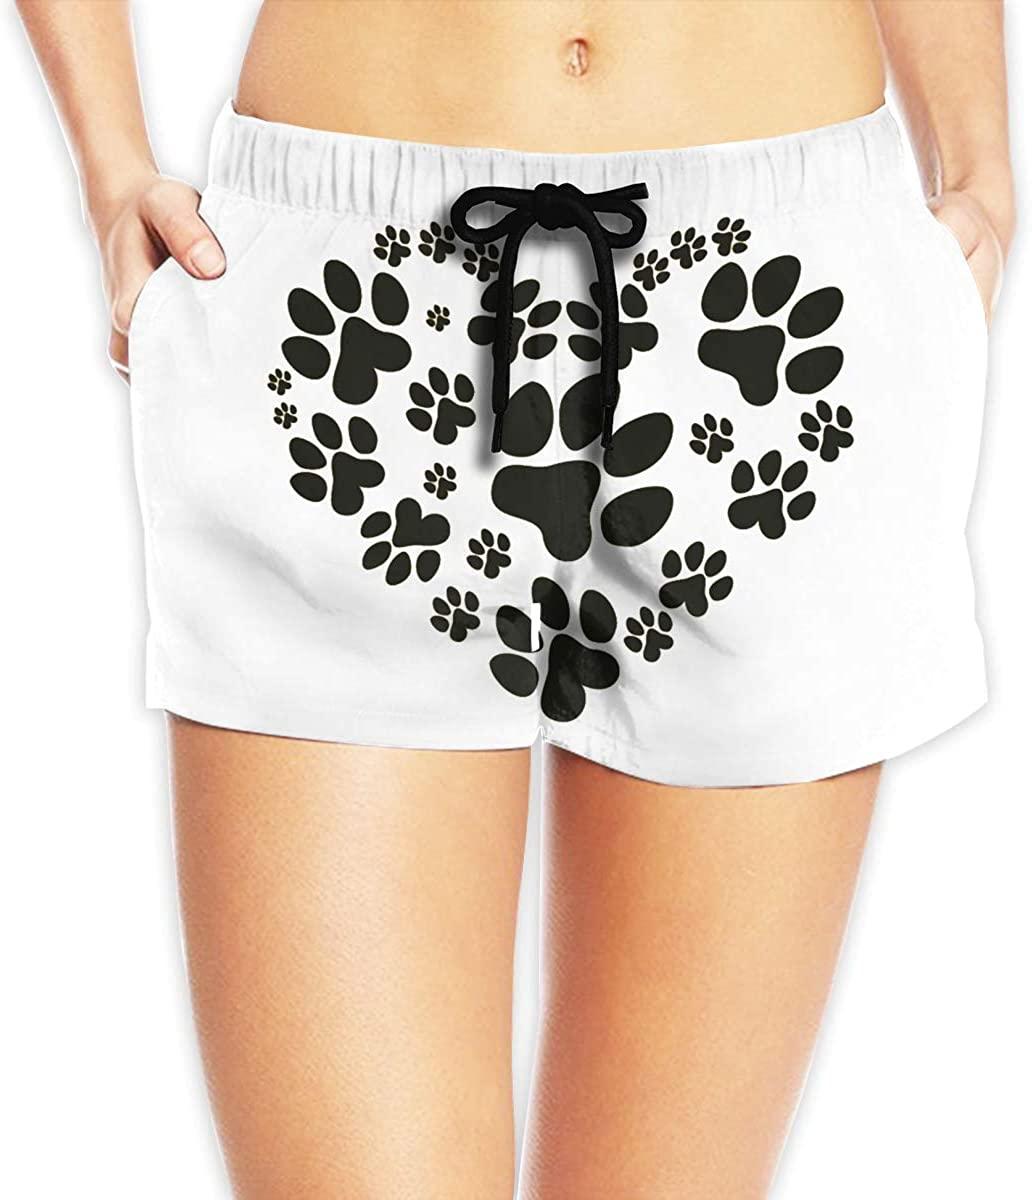 Dog Cat Paw Love Pattern Women's Female Beach Pants Summer Beachwear Board Shorts